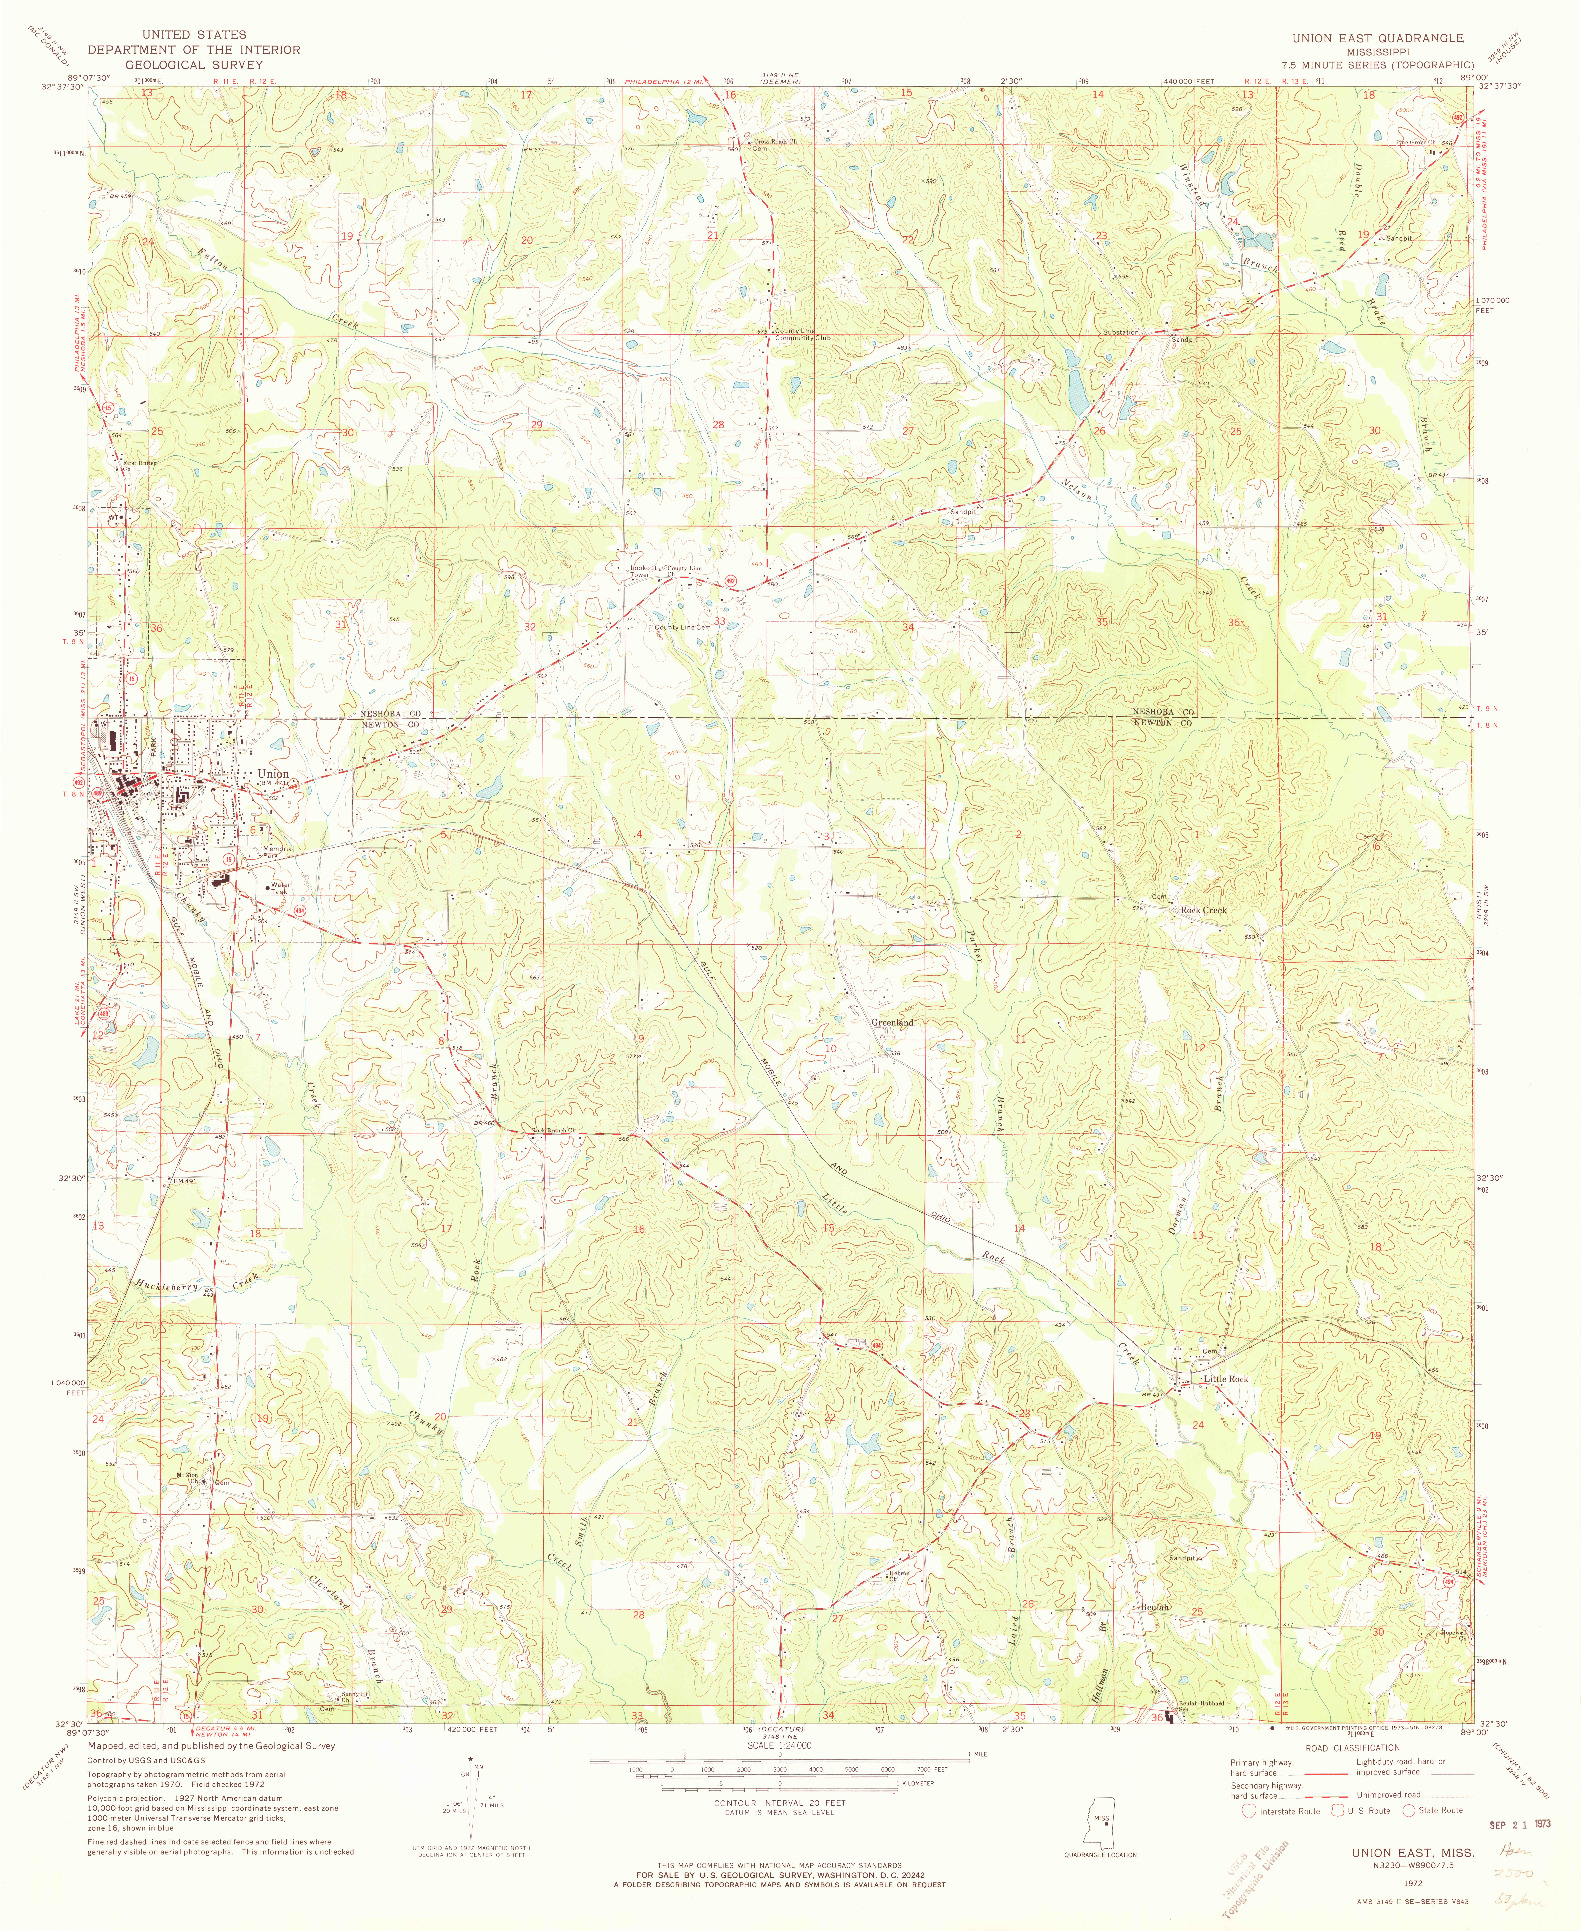 USGS 1:24000-SCALE QUADRANGLE FOR UNION EAST, MS 1972